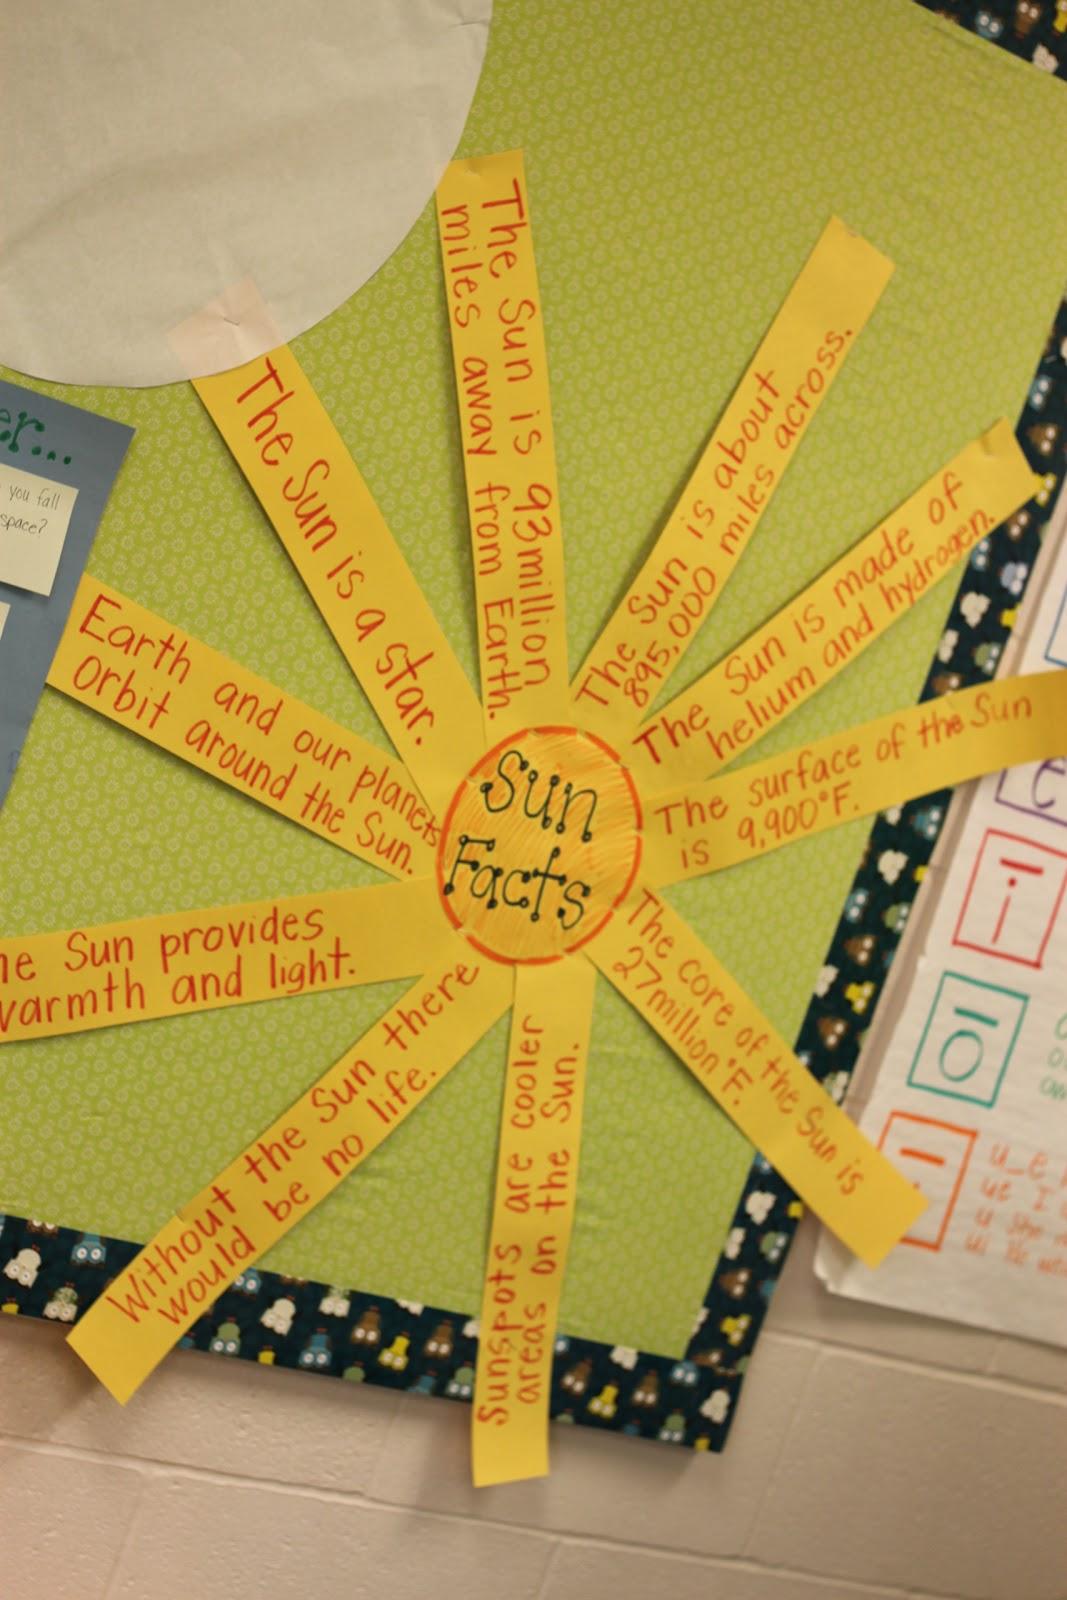 Sun The Sun And Tarot On Pinterest: Simply Second Grade: The Sun & Moon